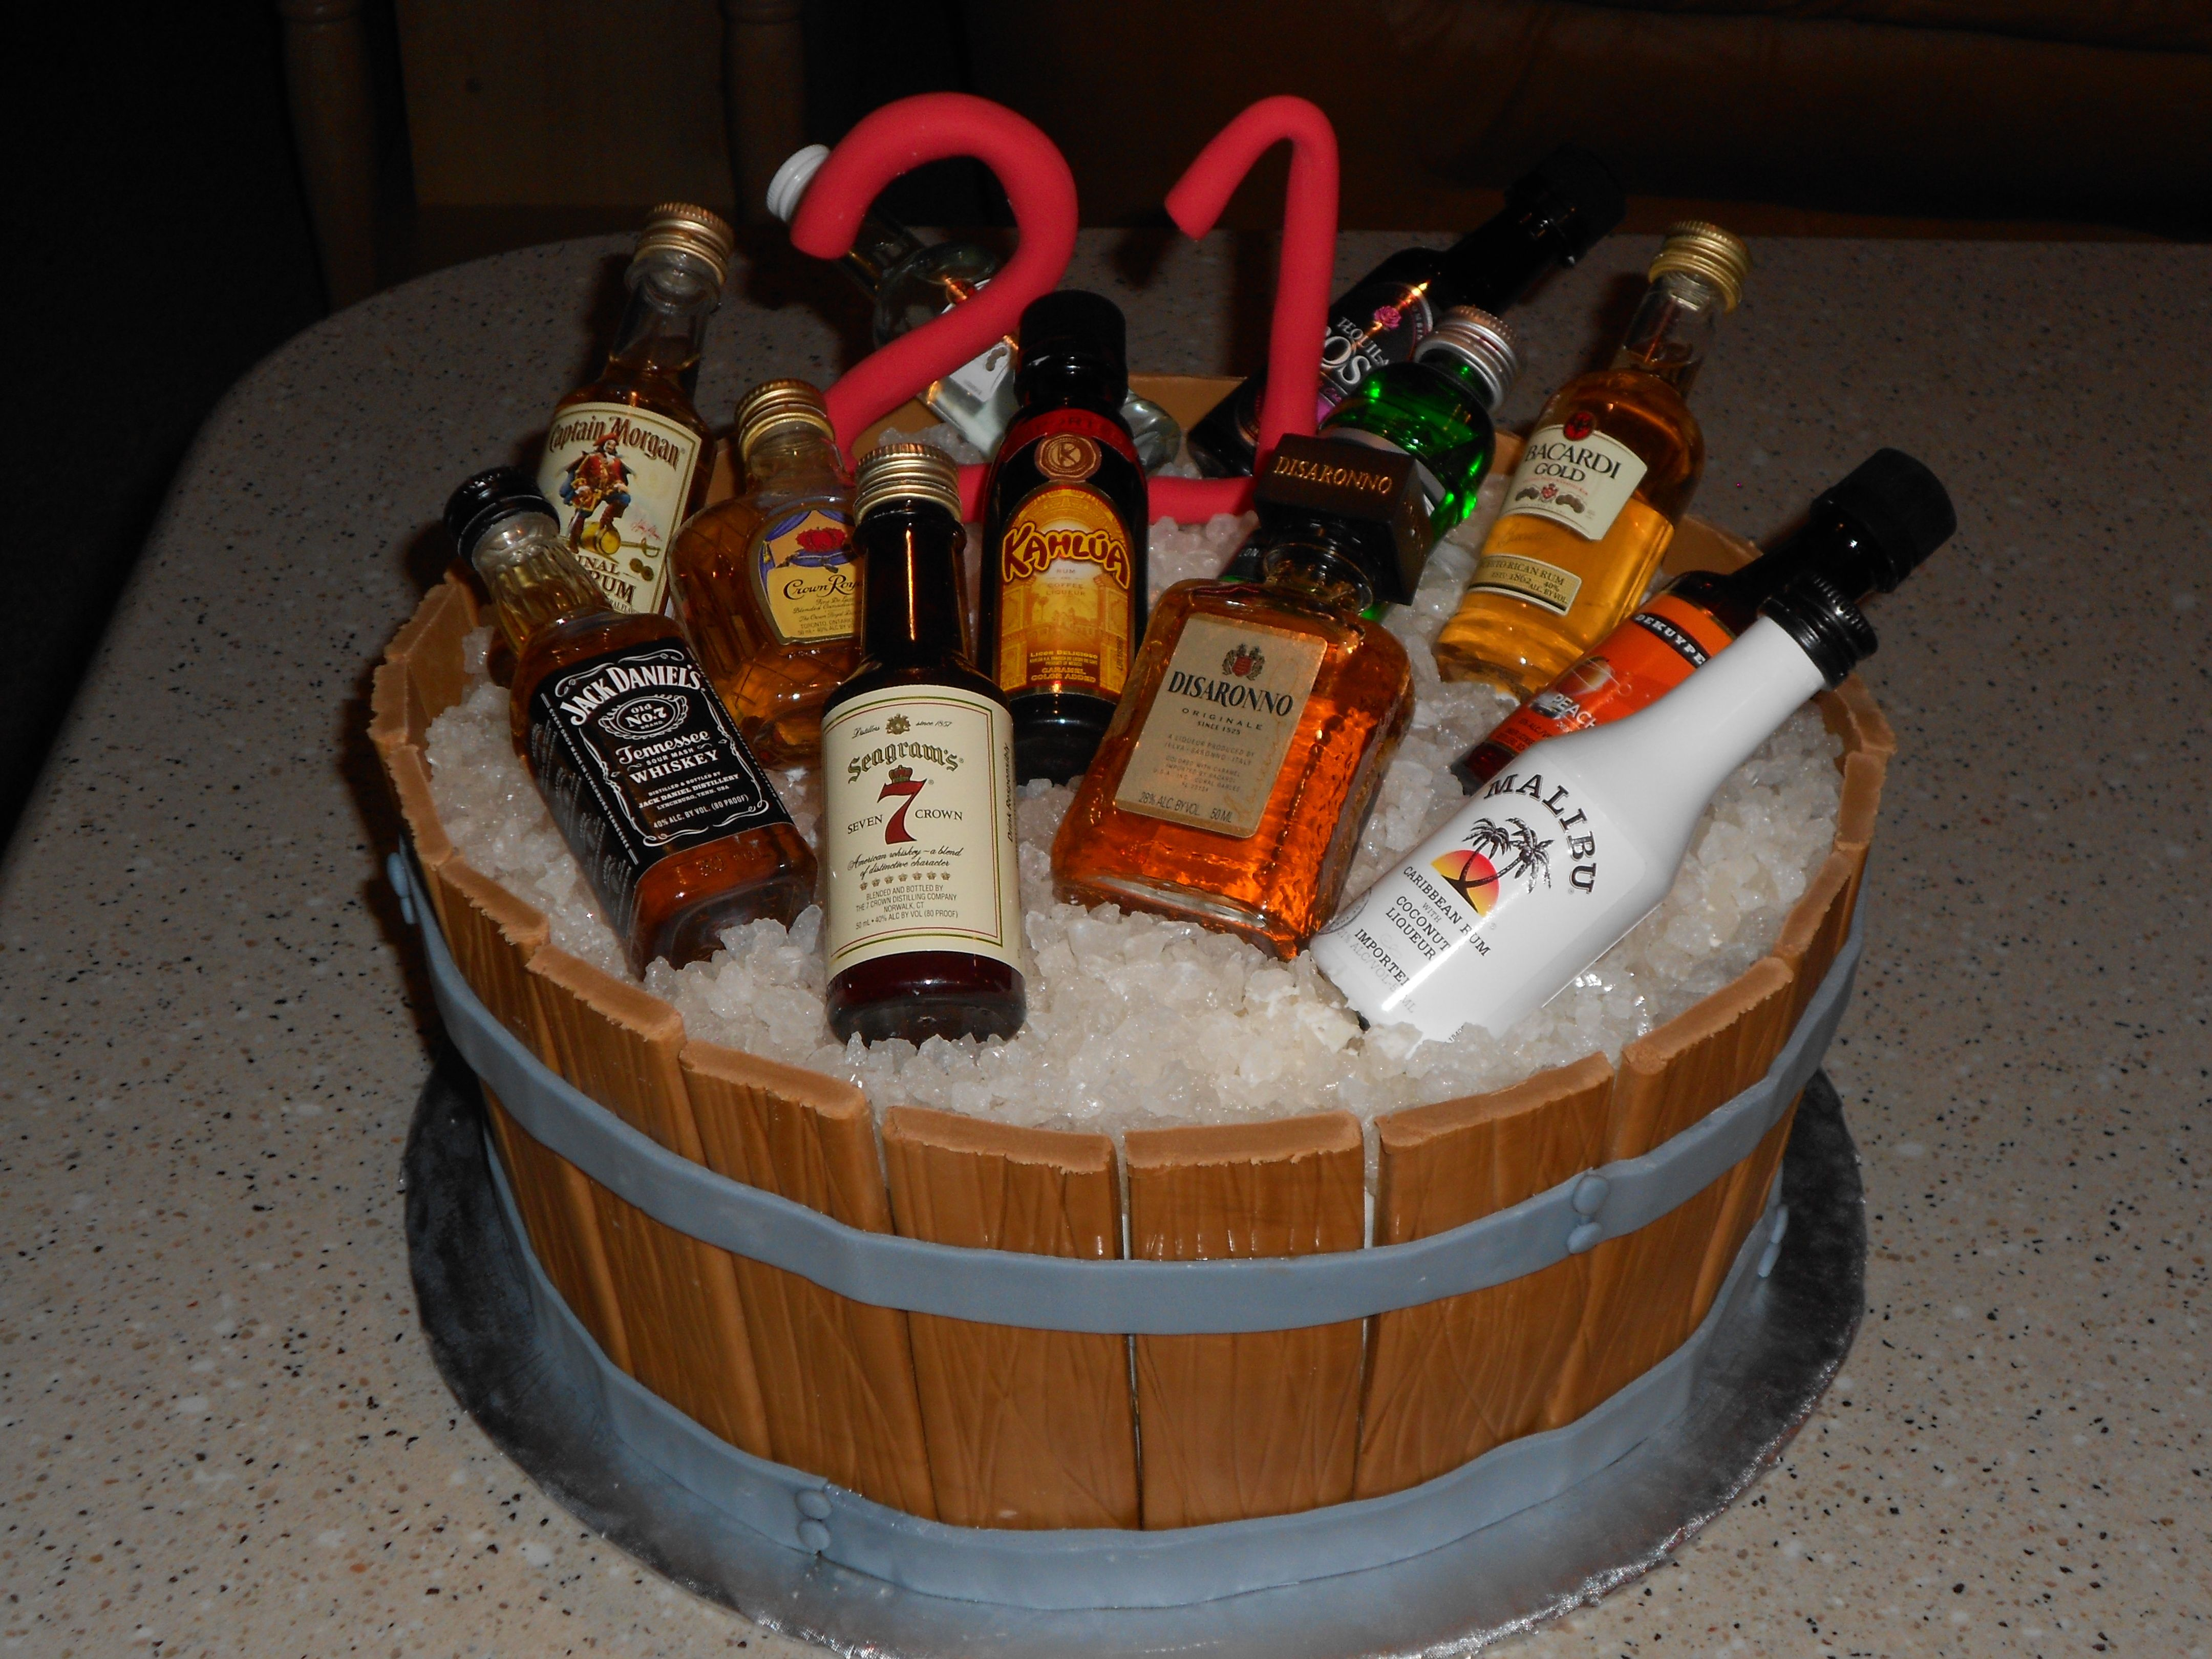 46+ 21st birthday cake ideas male ideas